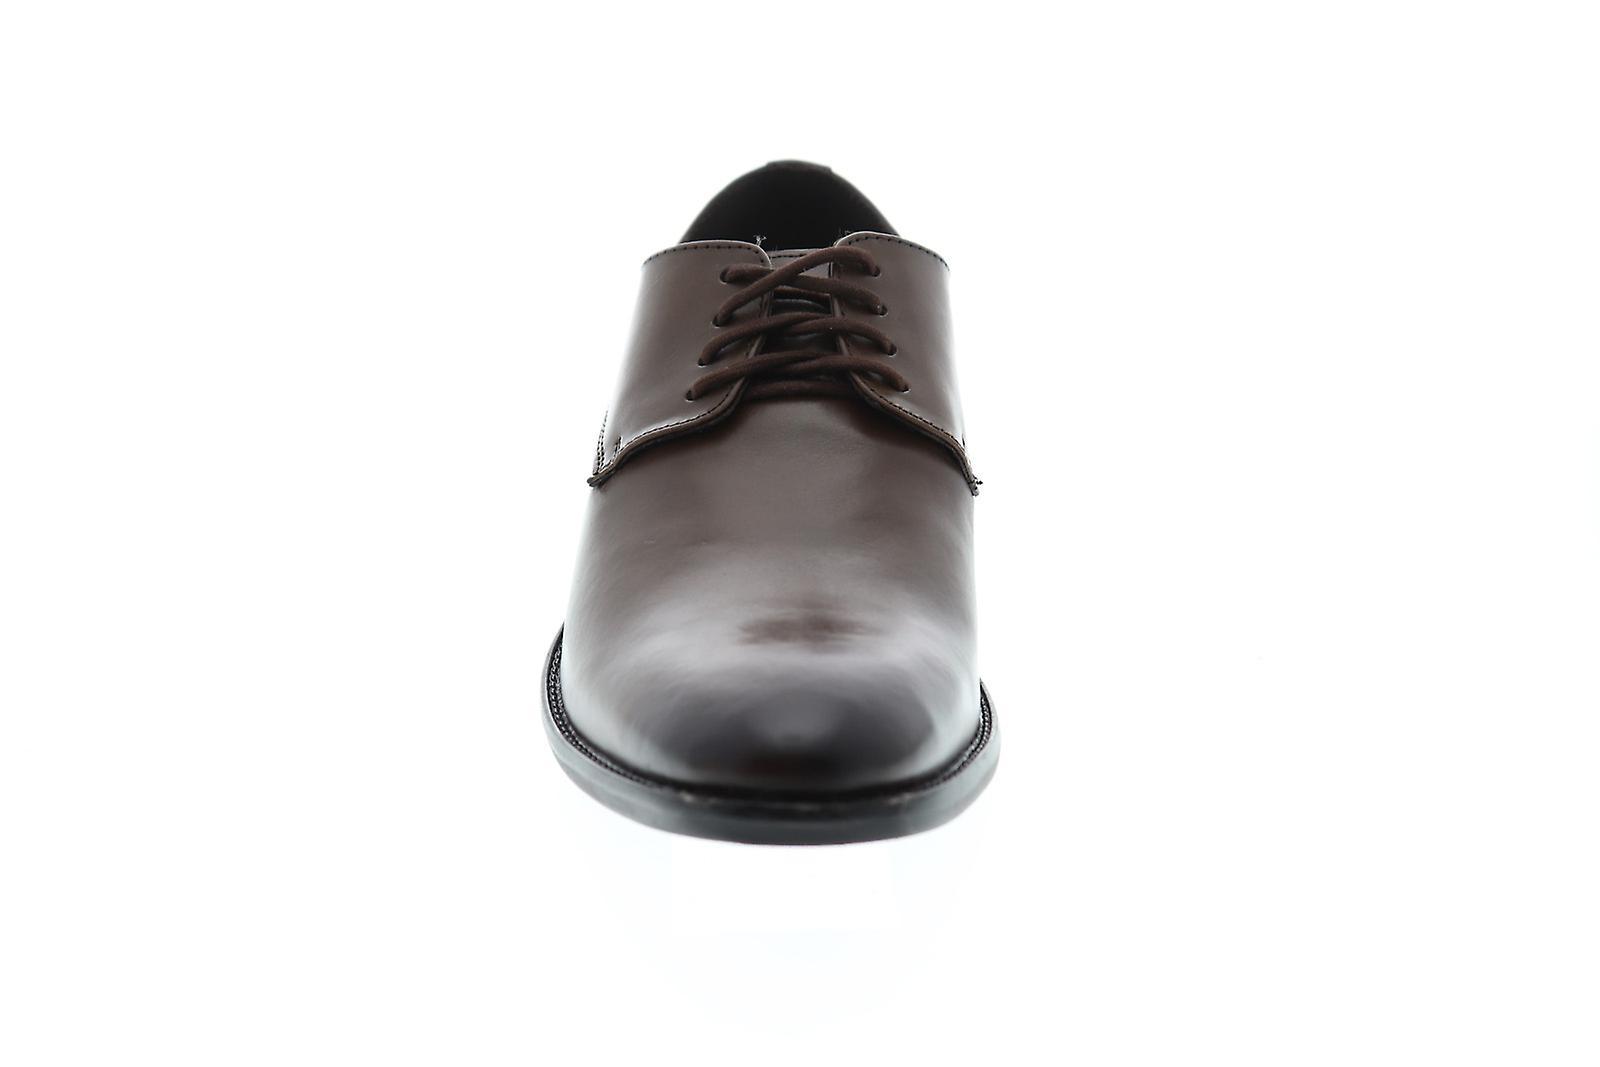 Giorgio Brutini Alton mens Brown läder klänning Lace up Oxfords skor